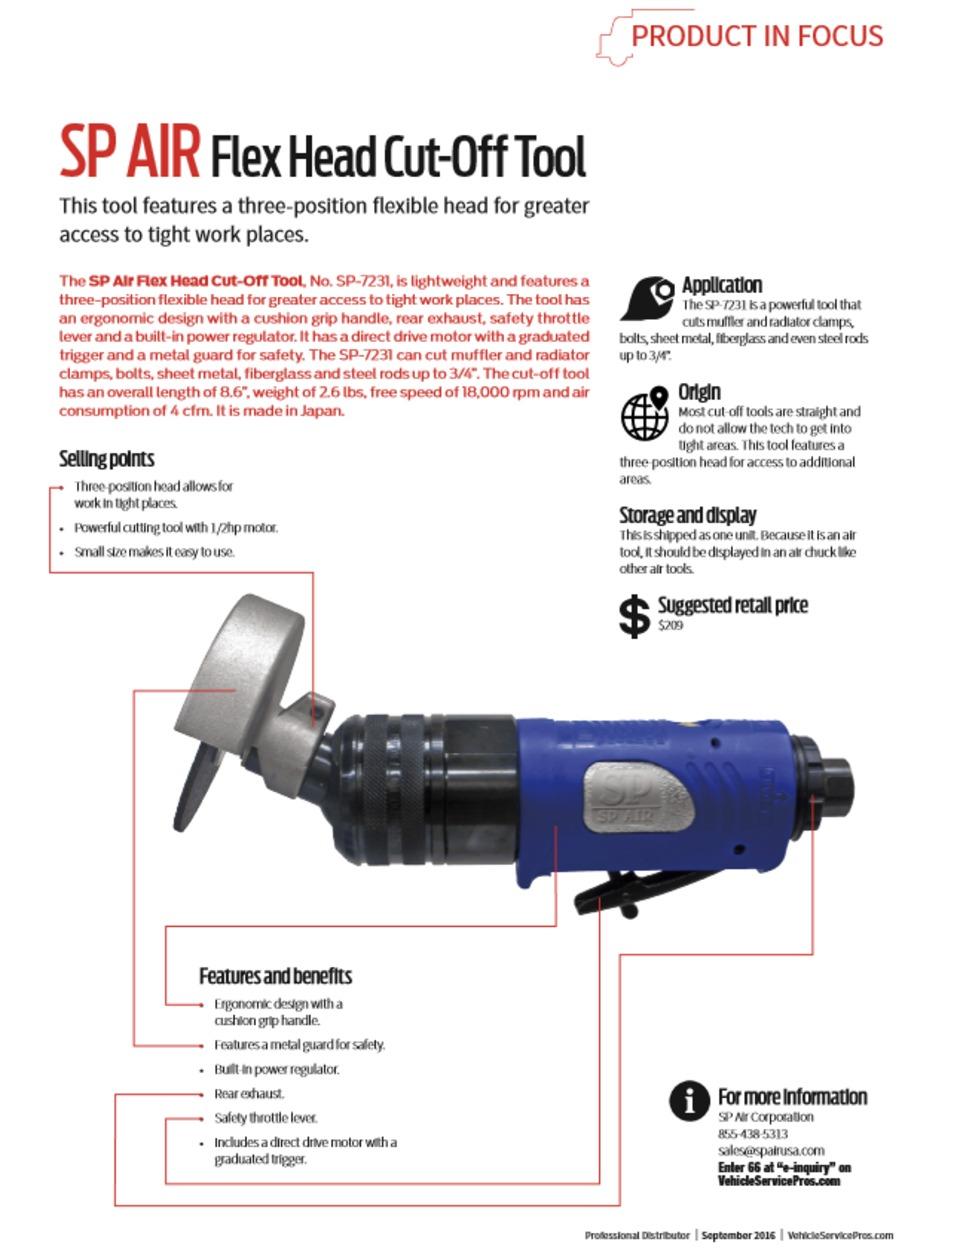 Product In Focus PDF: SP Air Flex Head Cut-Off Tool